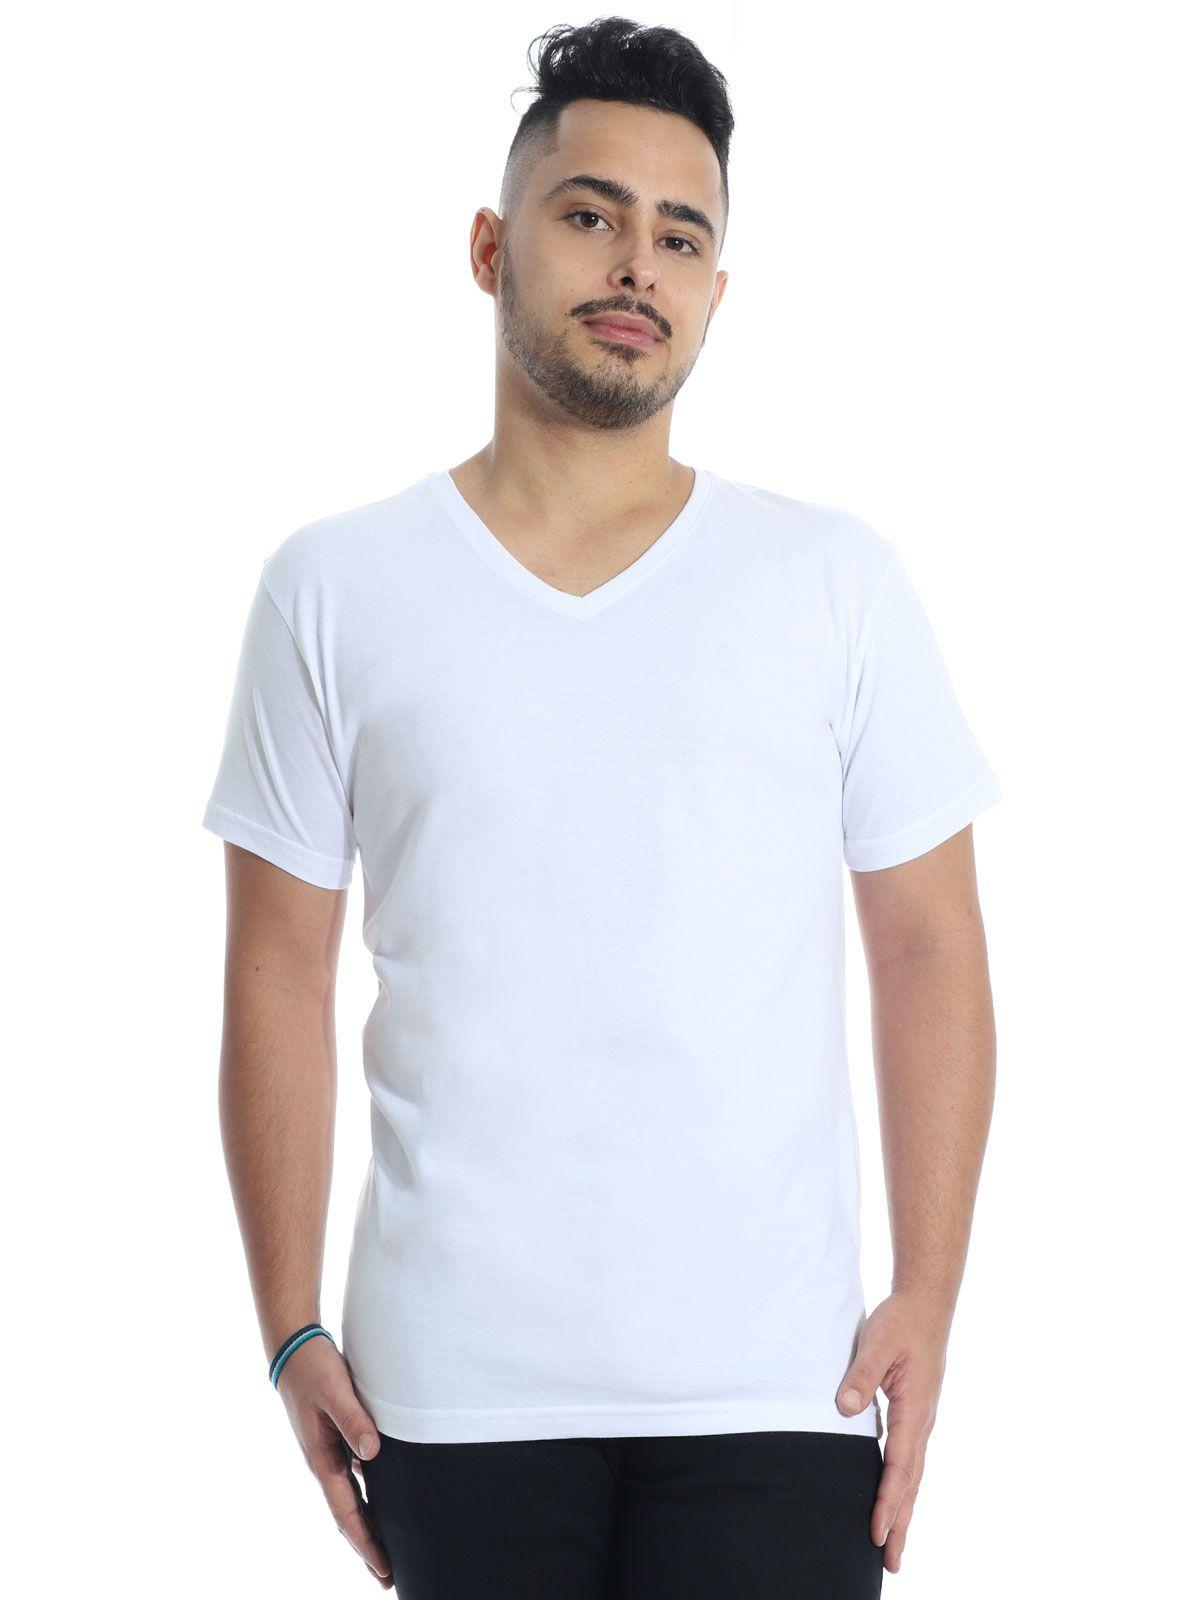 Camiseta Masculina Decote V. Algodão Slim Fit Lisa Branco